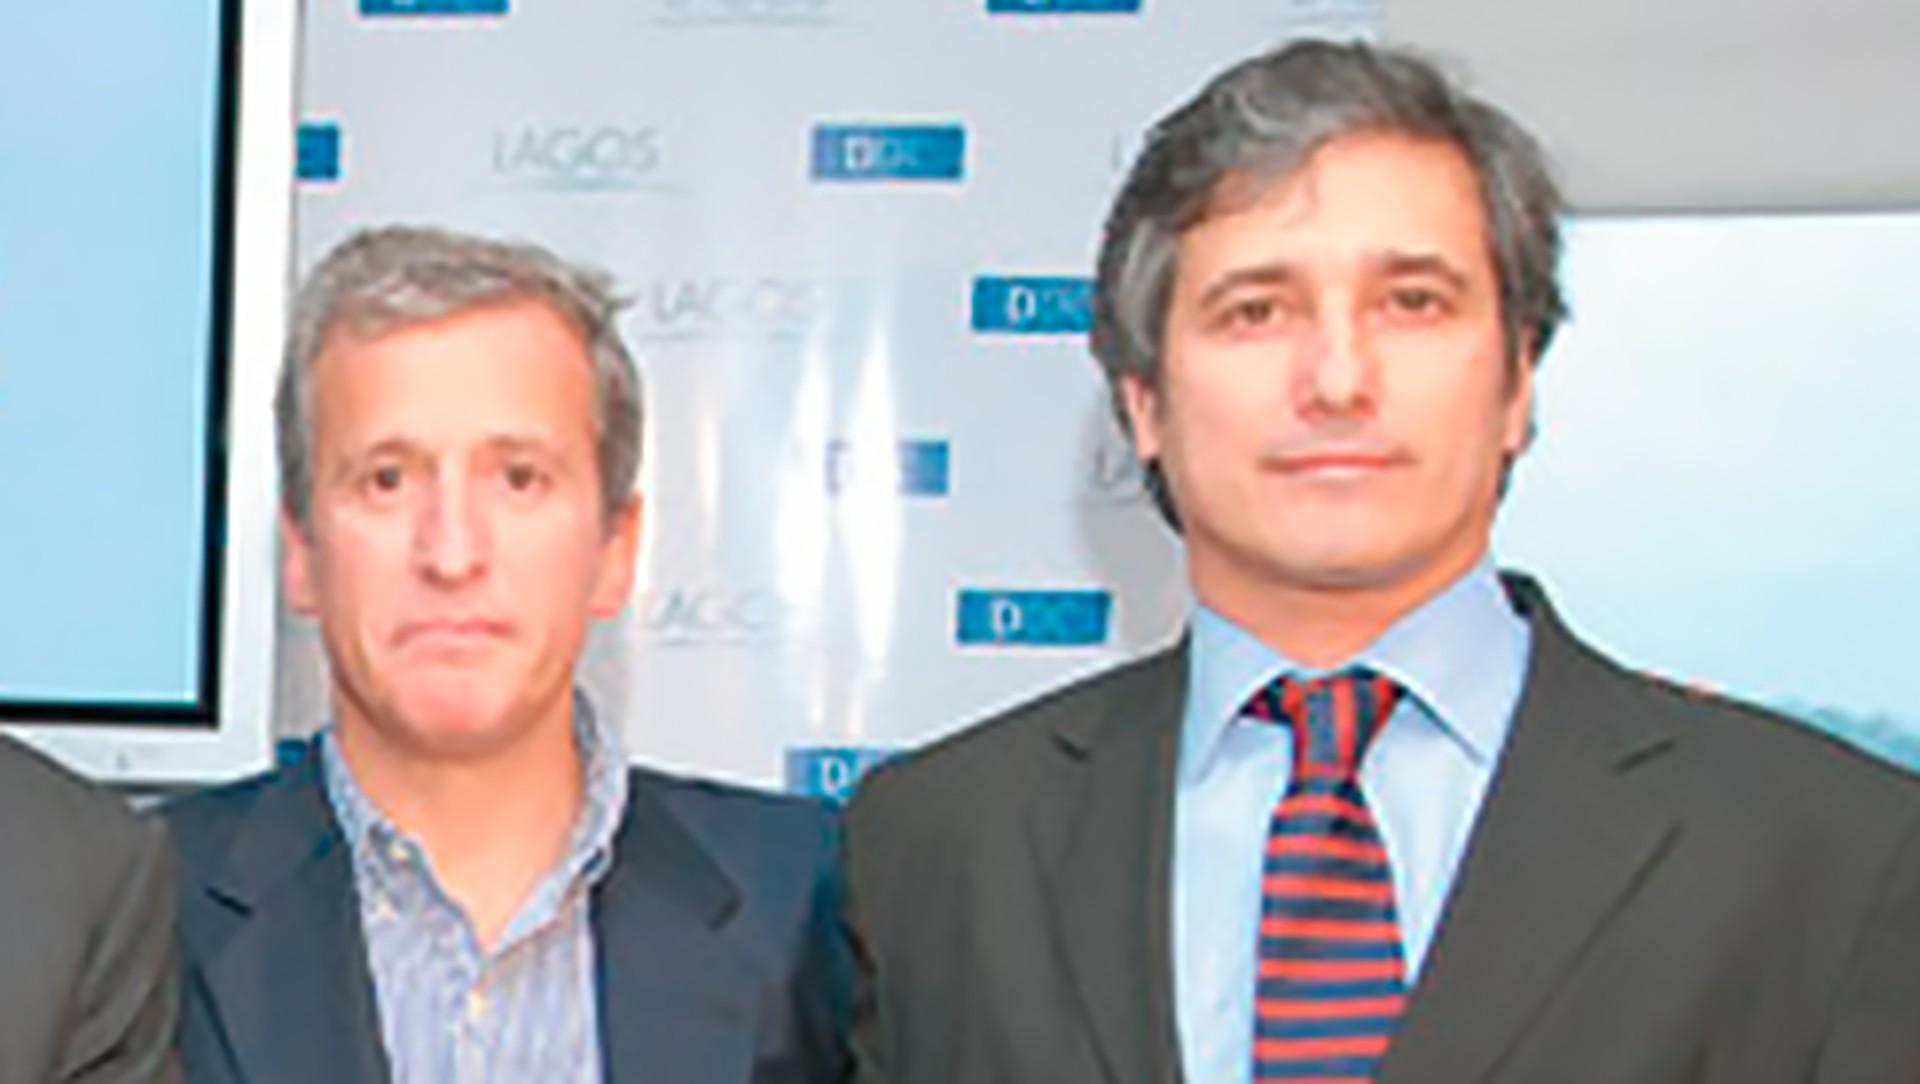 Nestor Marcelo Ramos Juan Pedro Damiani